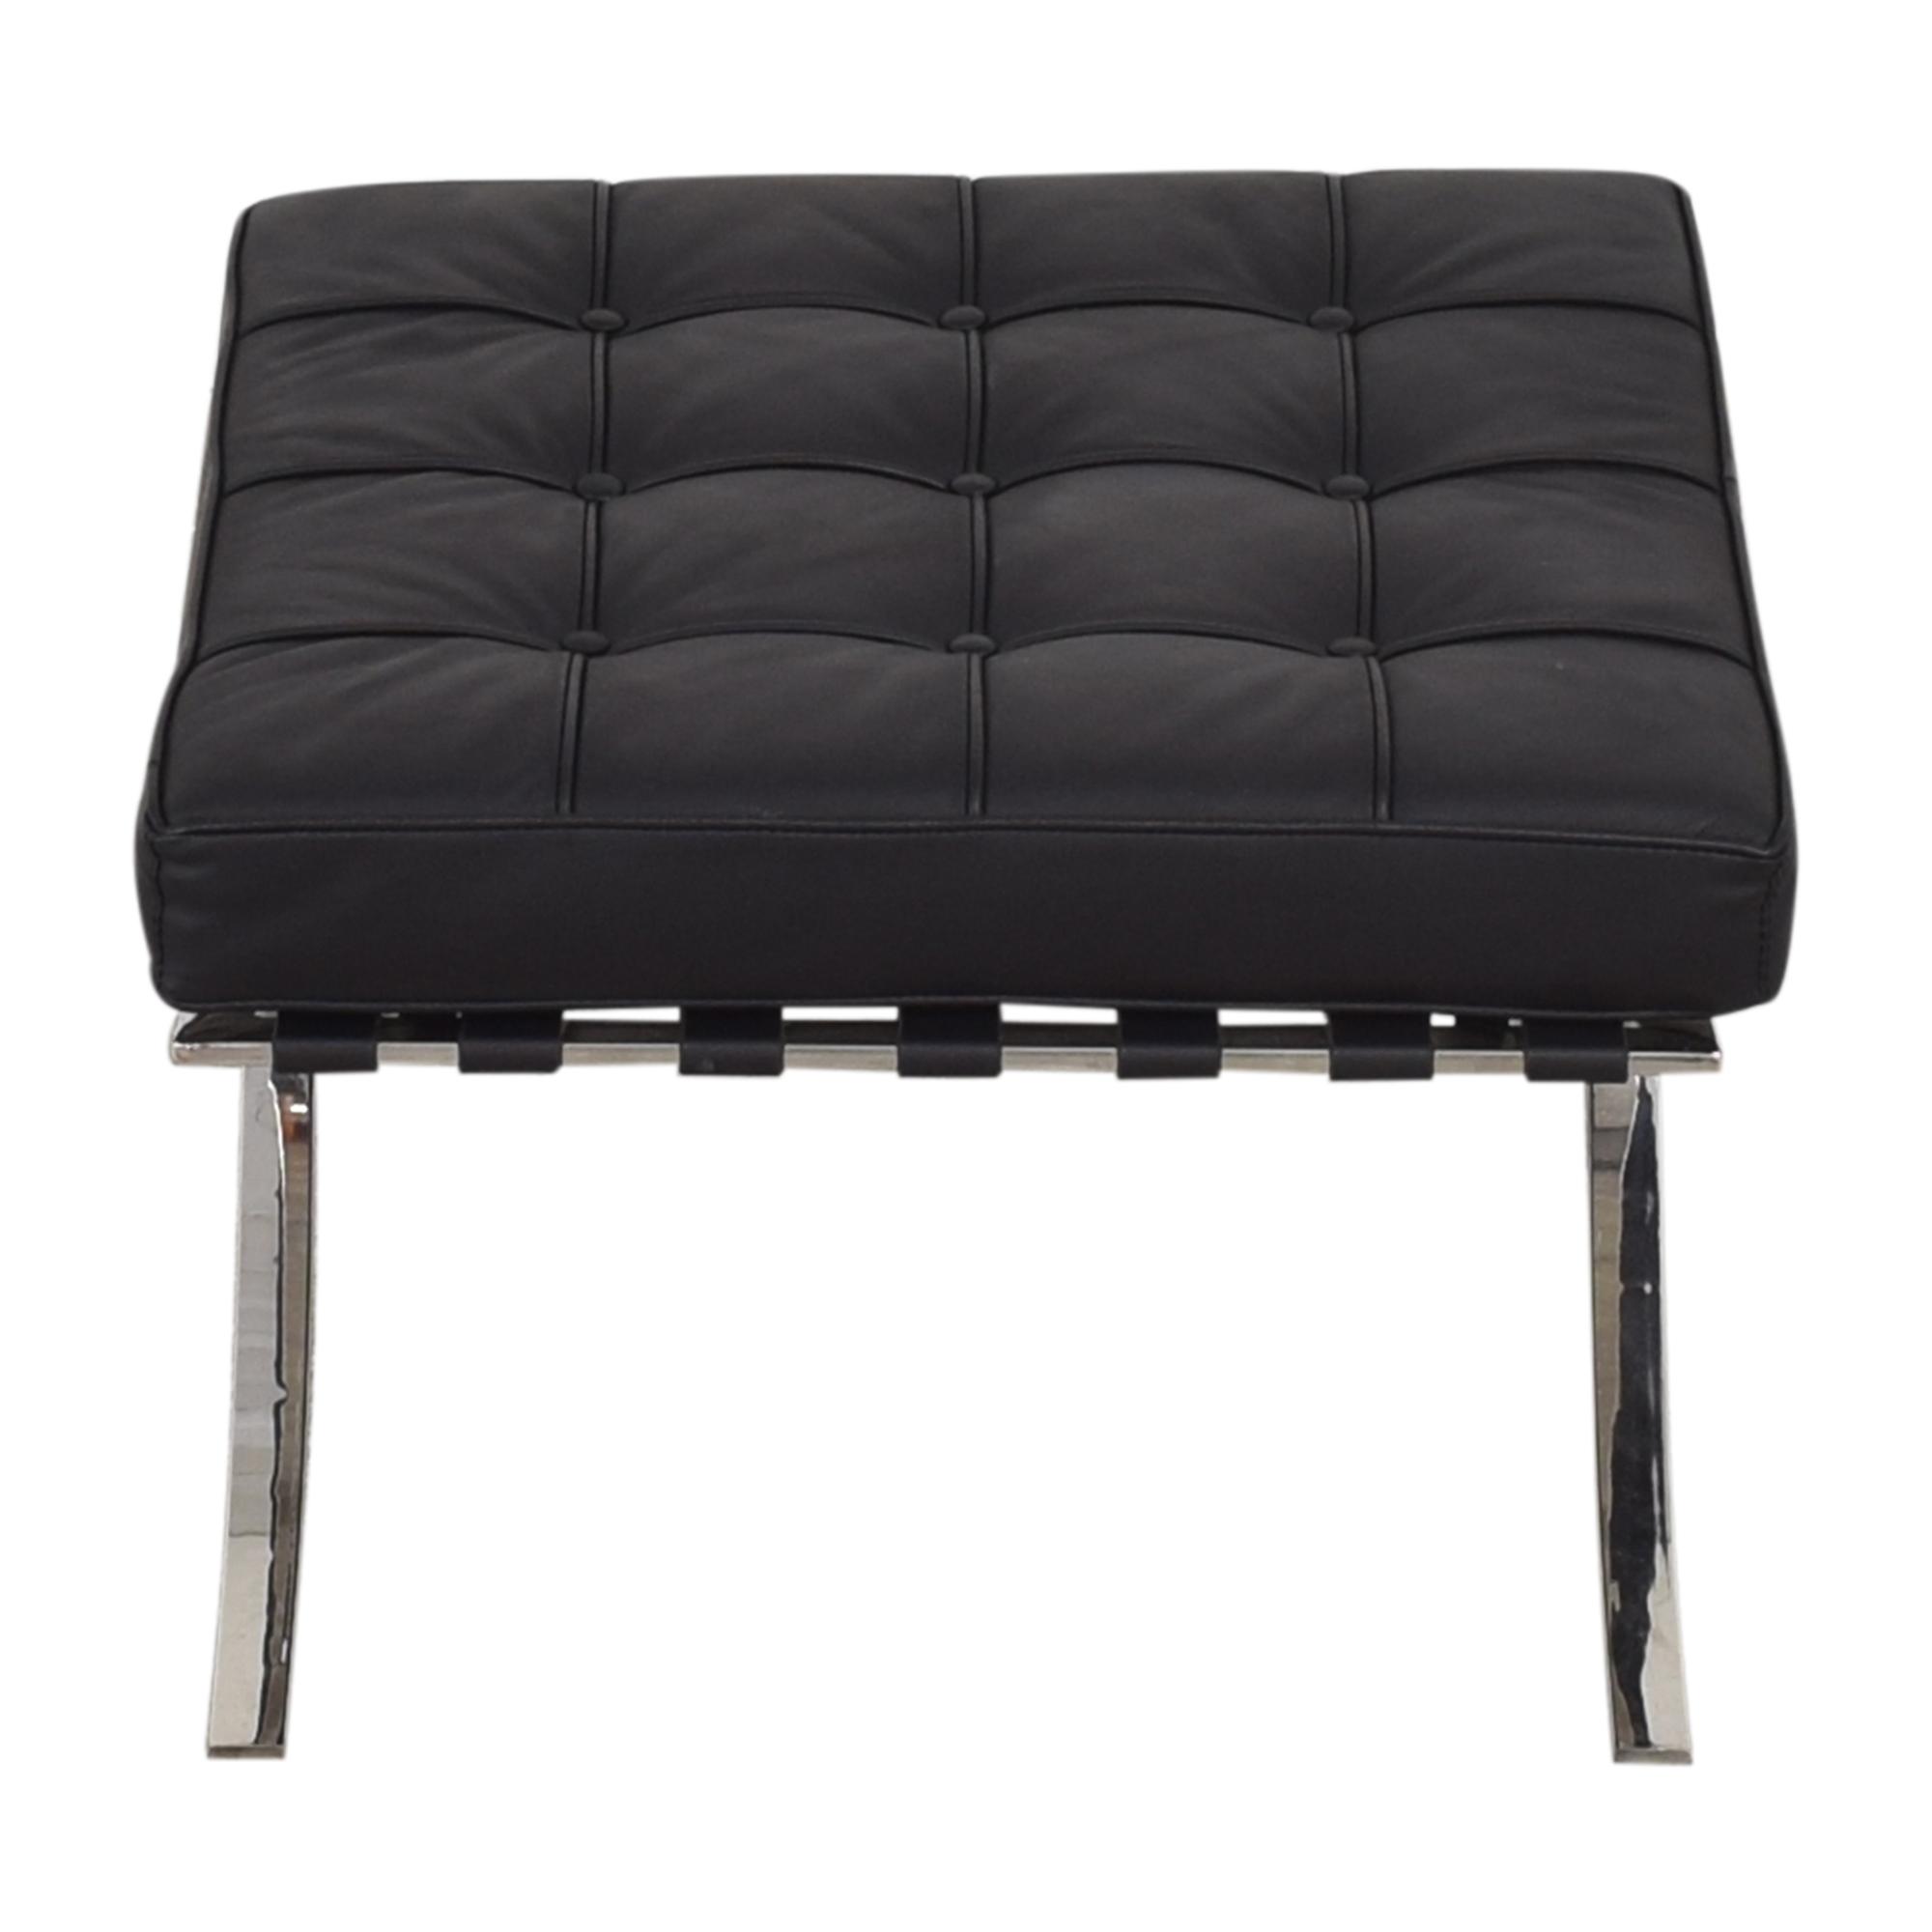 VIG VIG Furniture Bellatrix X-Leg Ottoman nyc